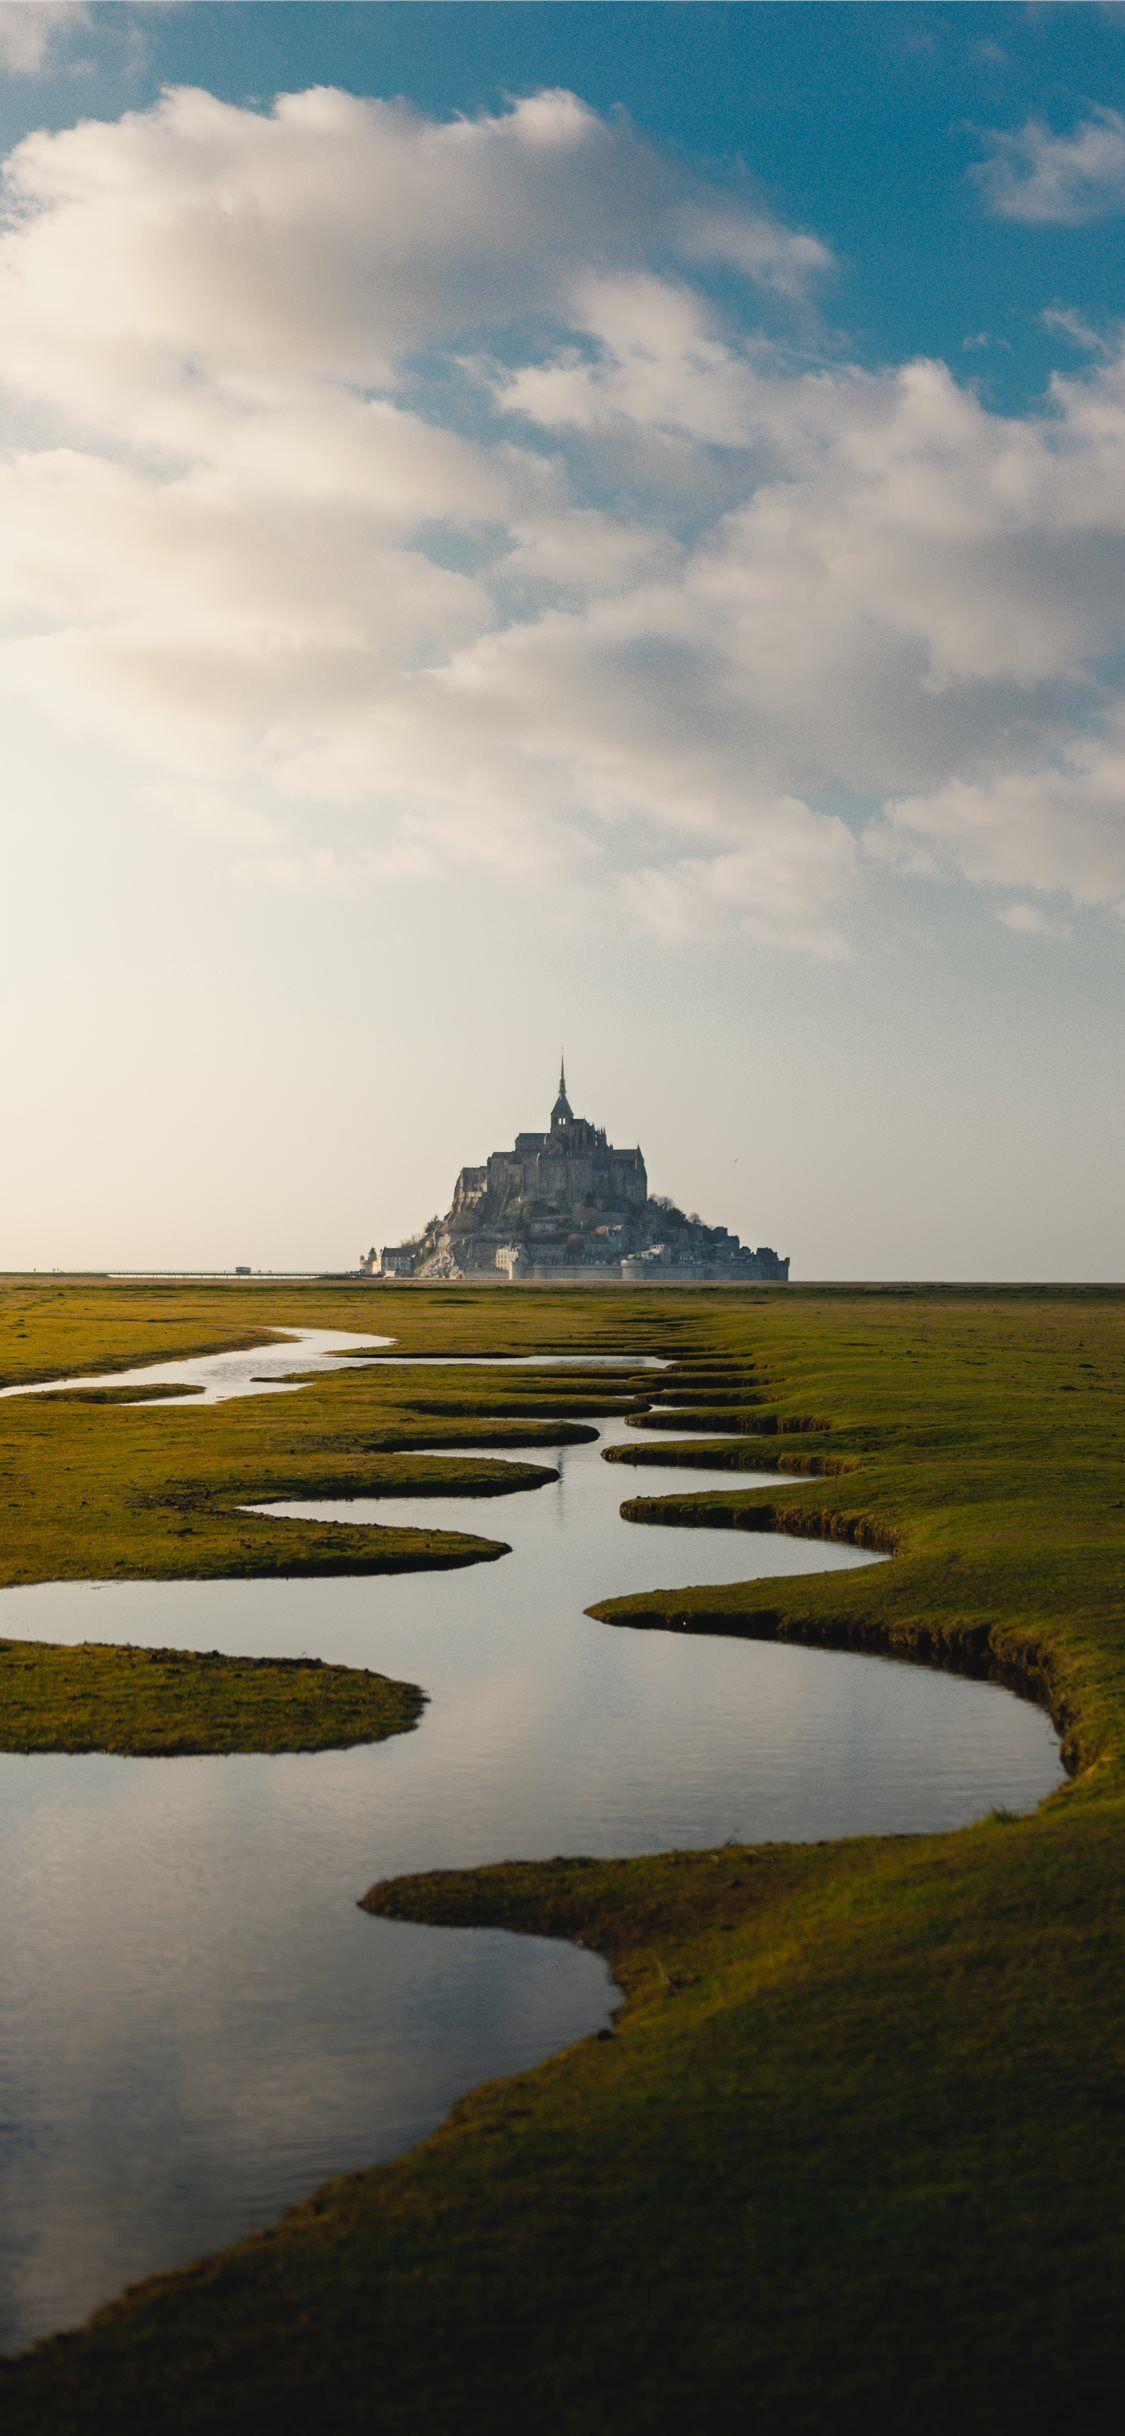 Free download the Mont Saint Michel France wallpaper